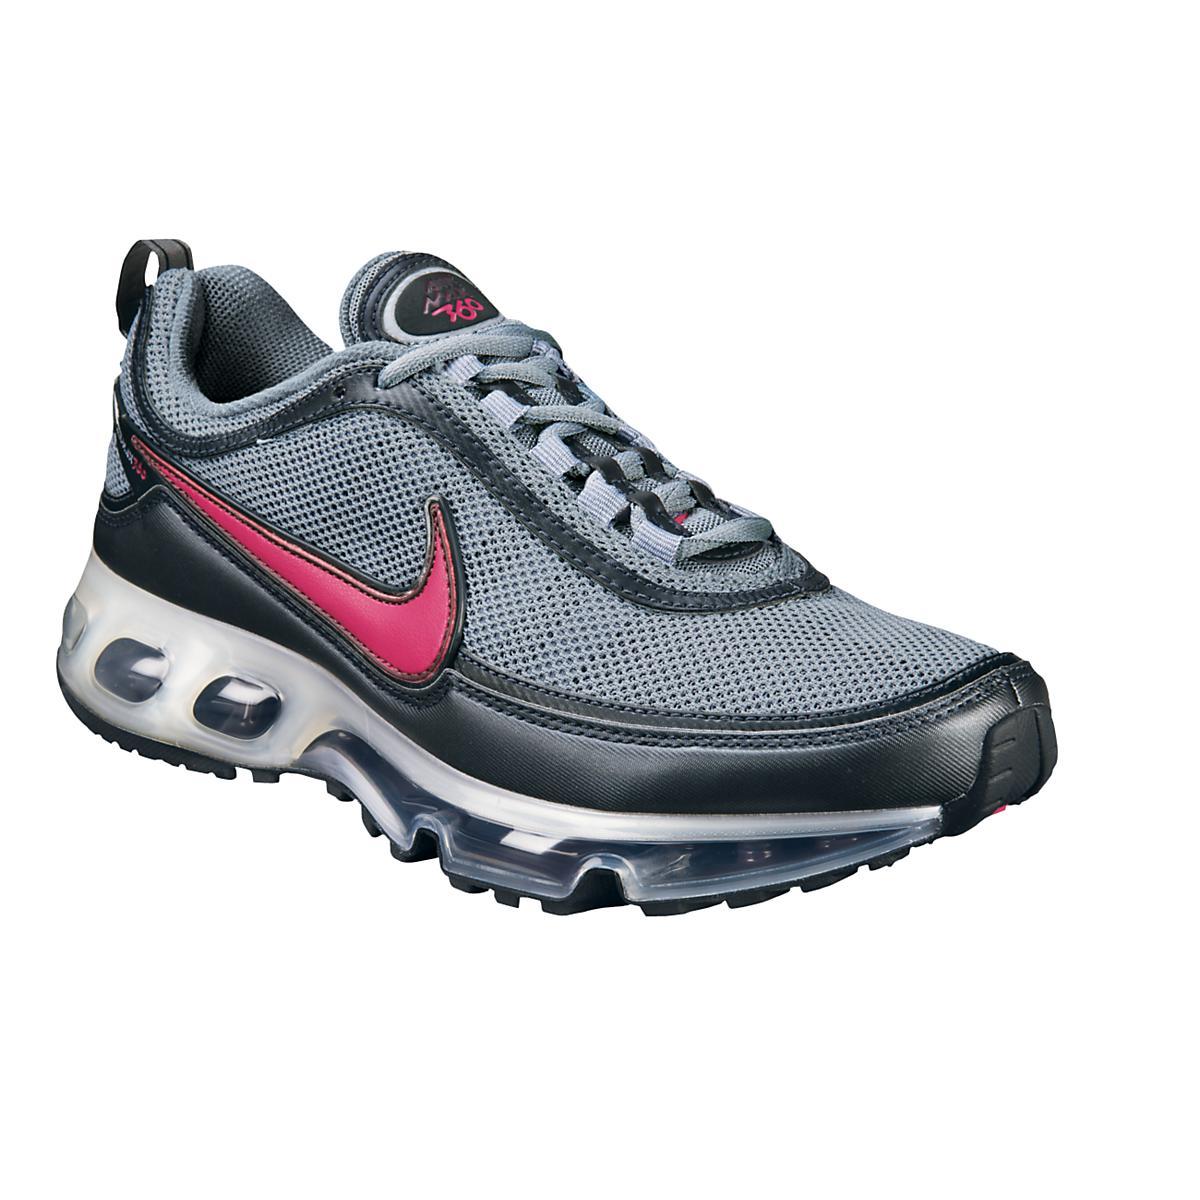 buy popular cb4ed 2bf47 Womens Nike Air Max 360 II Running Shoe at Road Runner Sports